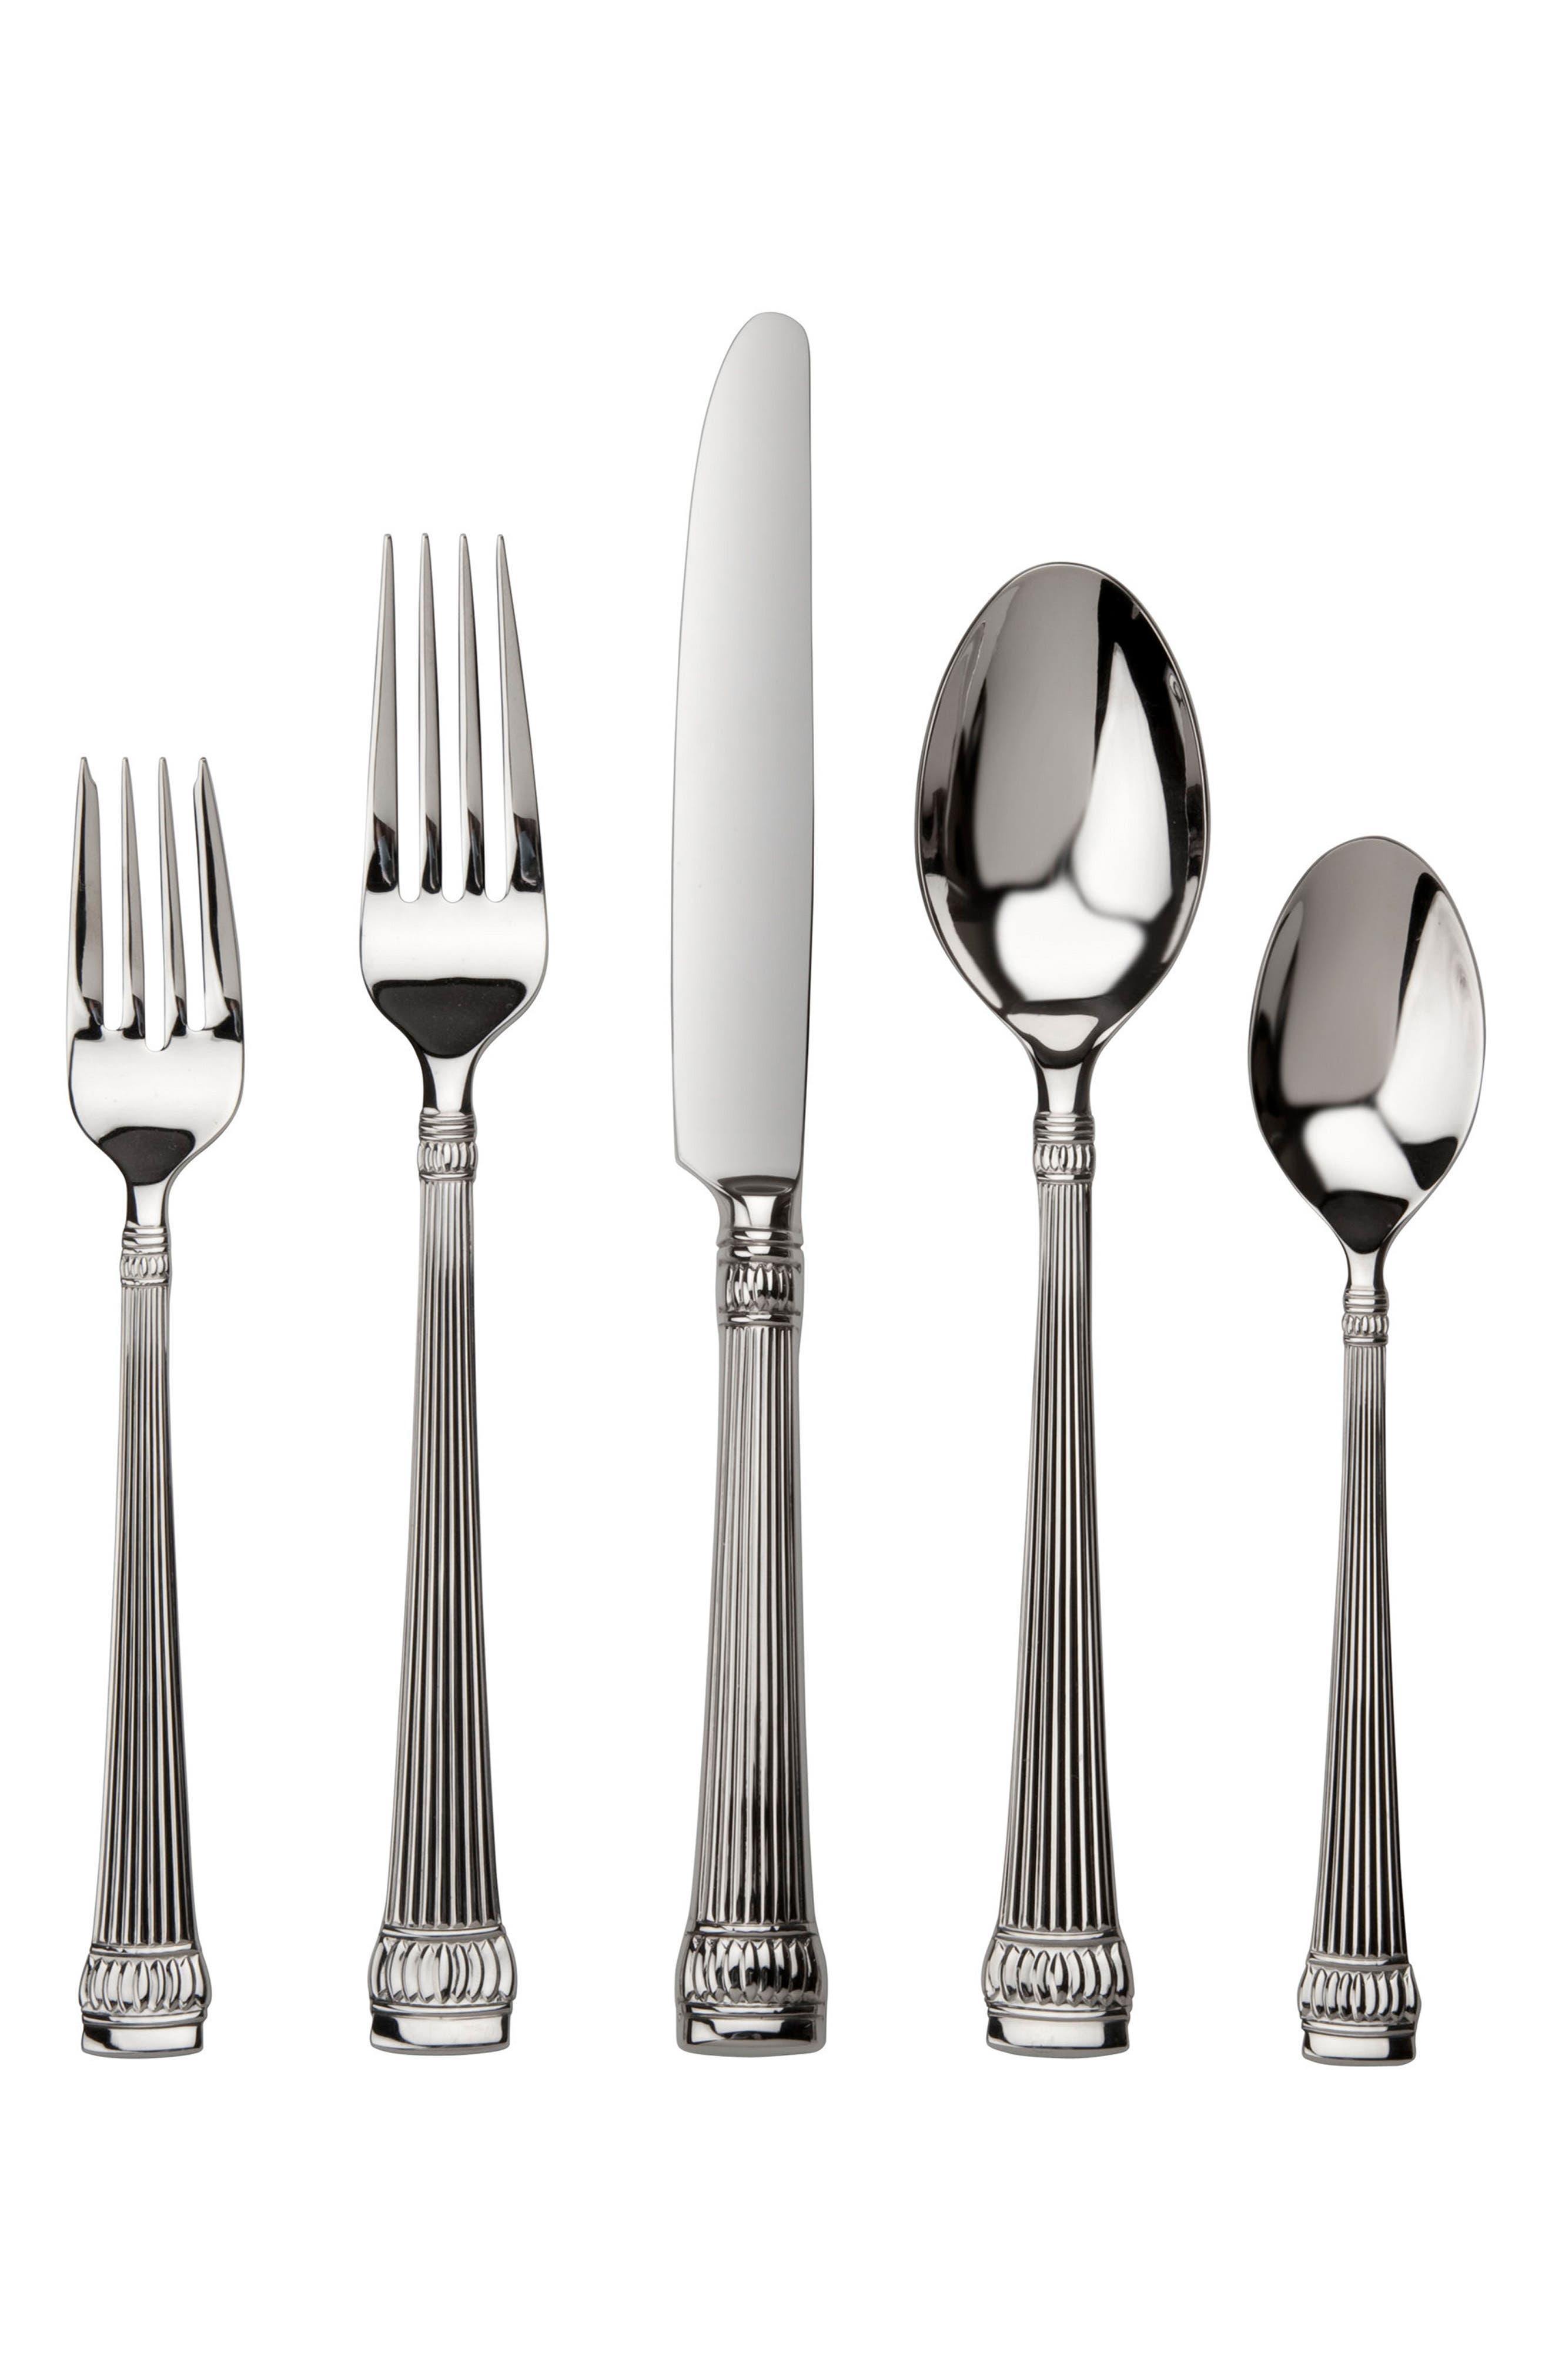 Main Image - Ricci Argentieri Girasole 45-Piece Stainless Steel Flatware Set